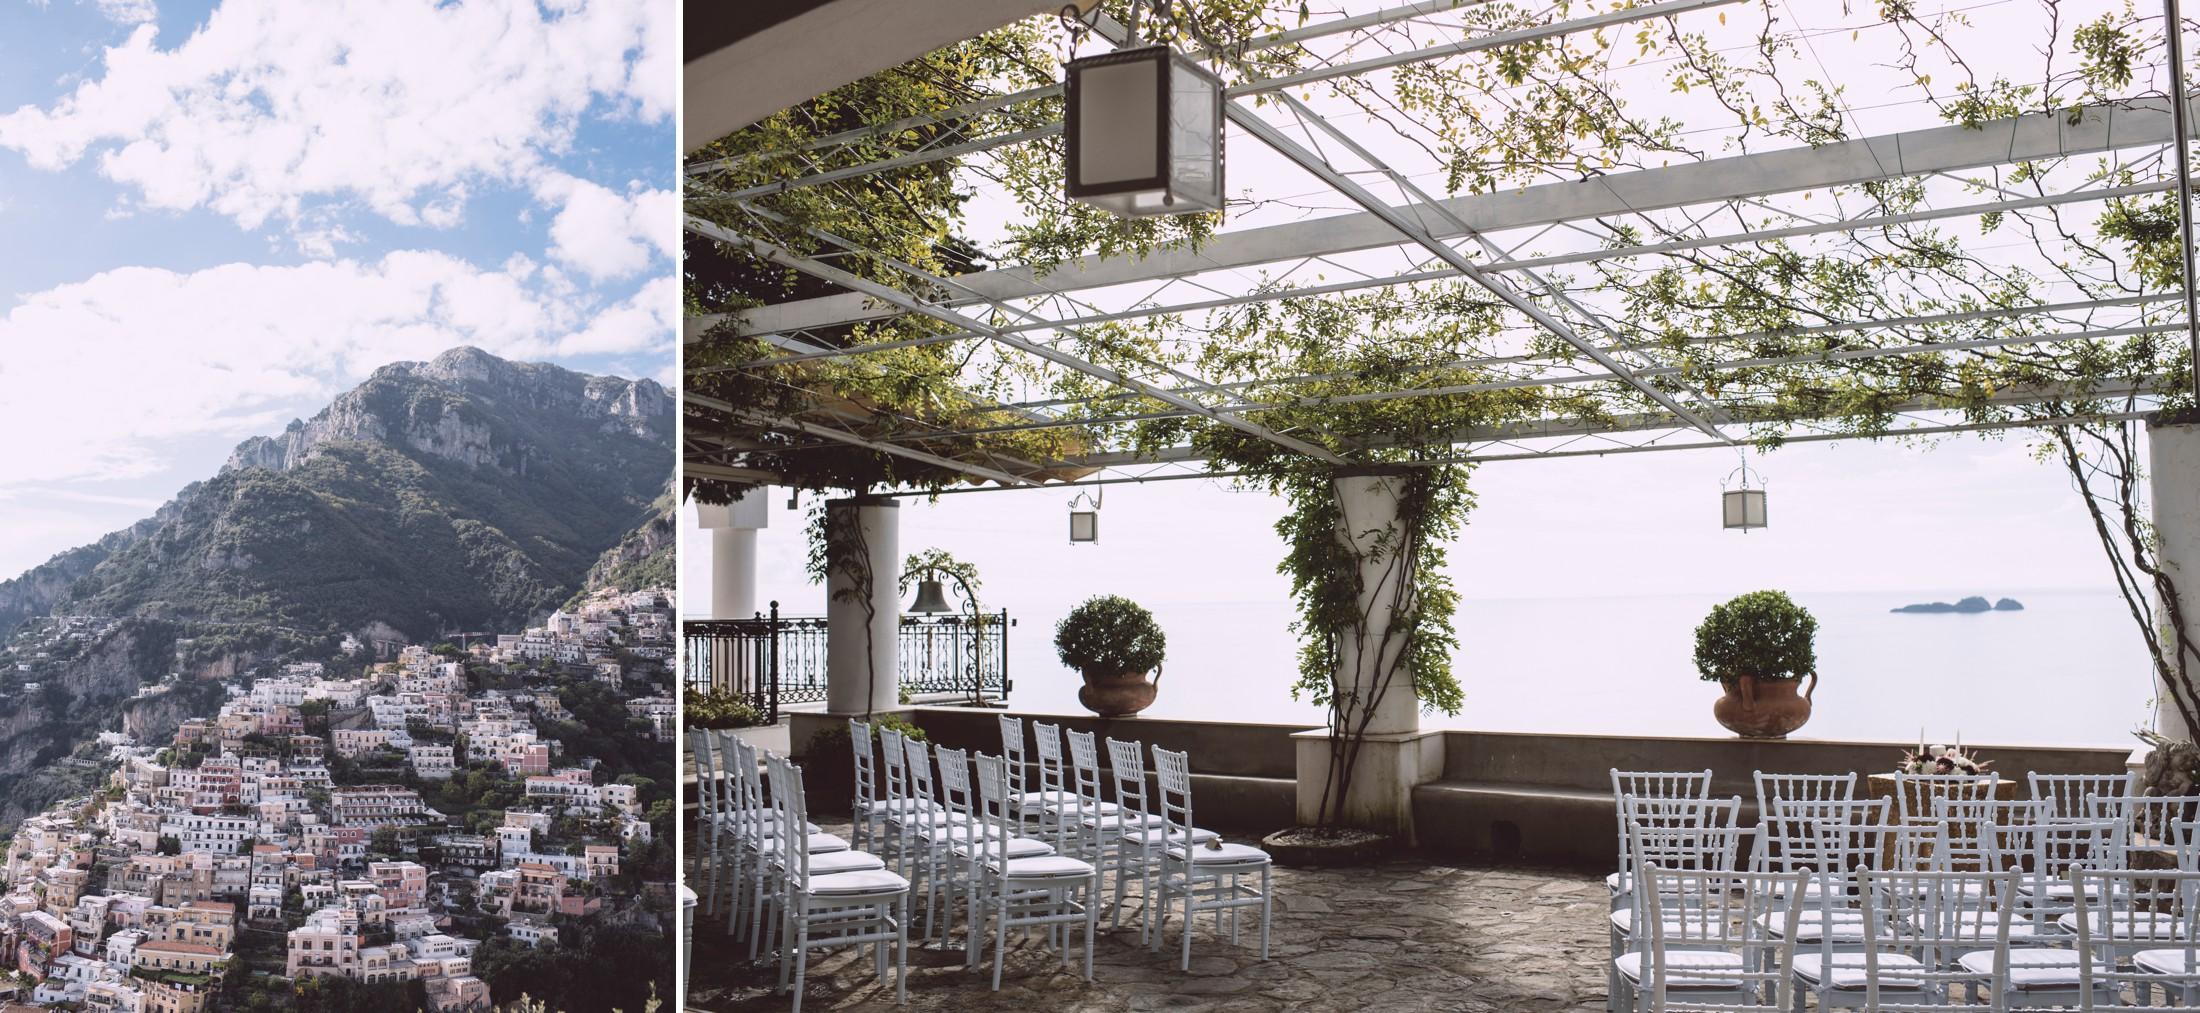 positano wedding collage positano view and wedding ceremony setting